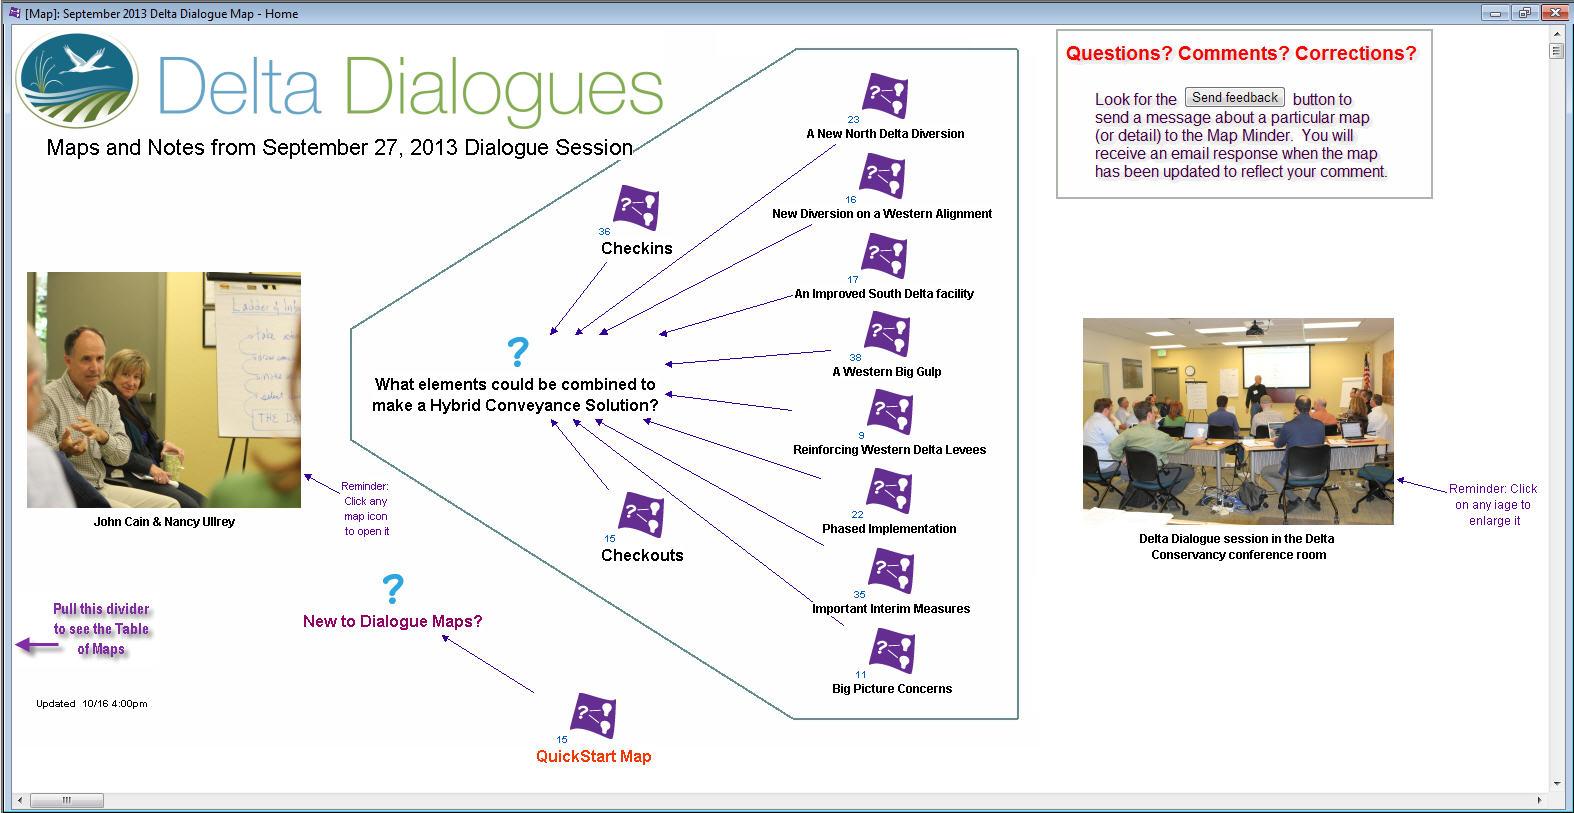 September 2013 Dialogue Maps